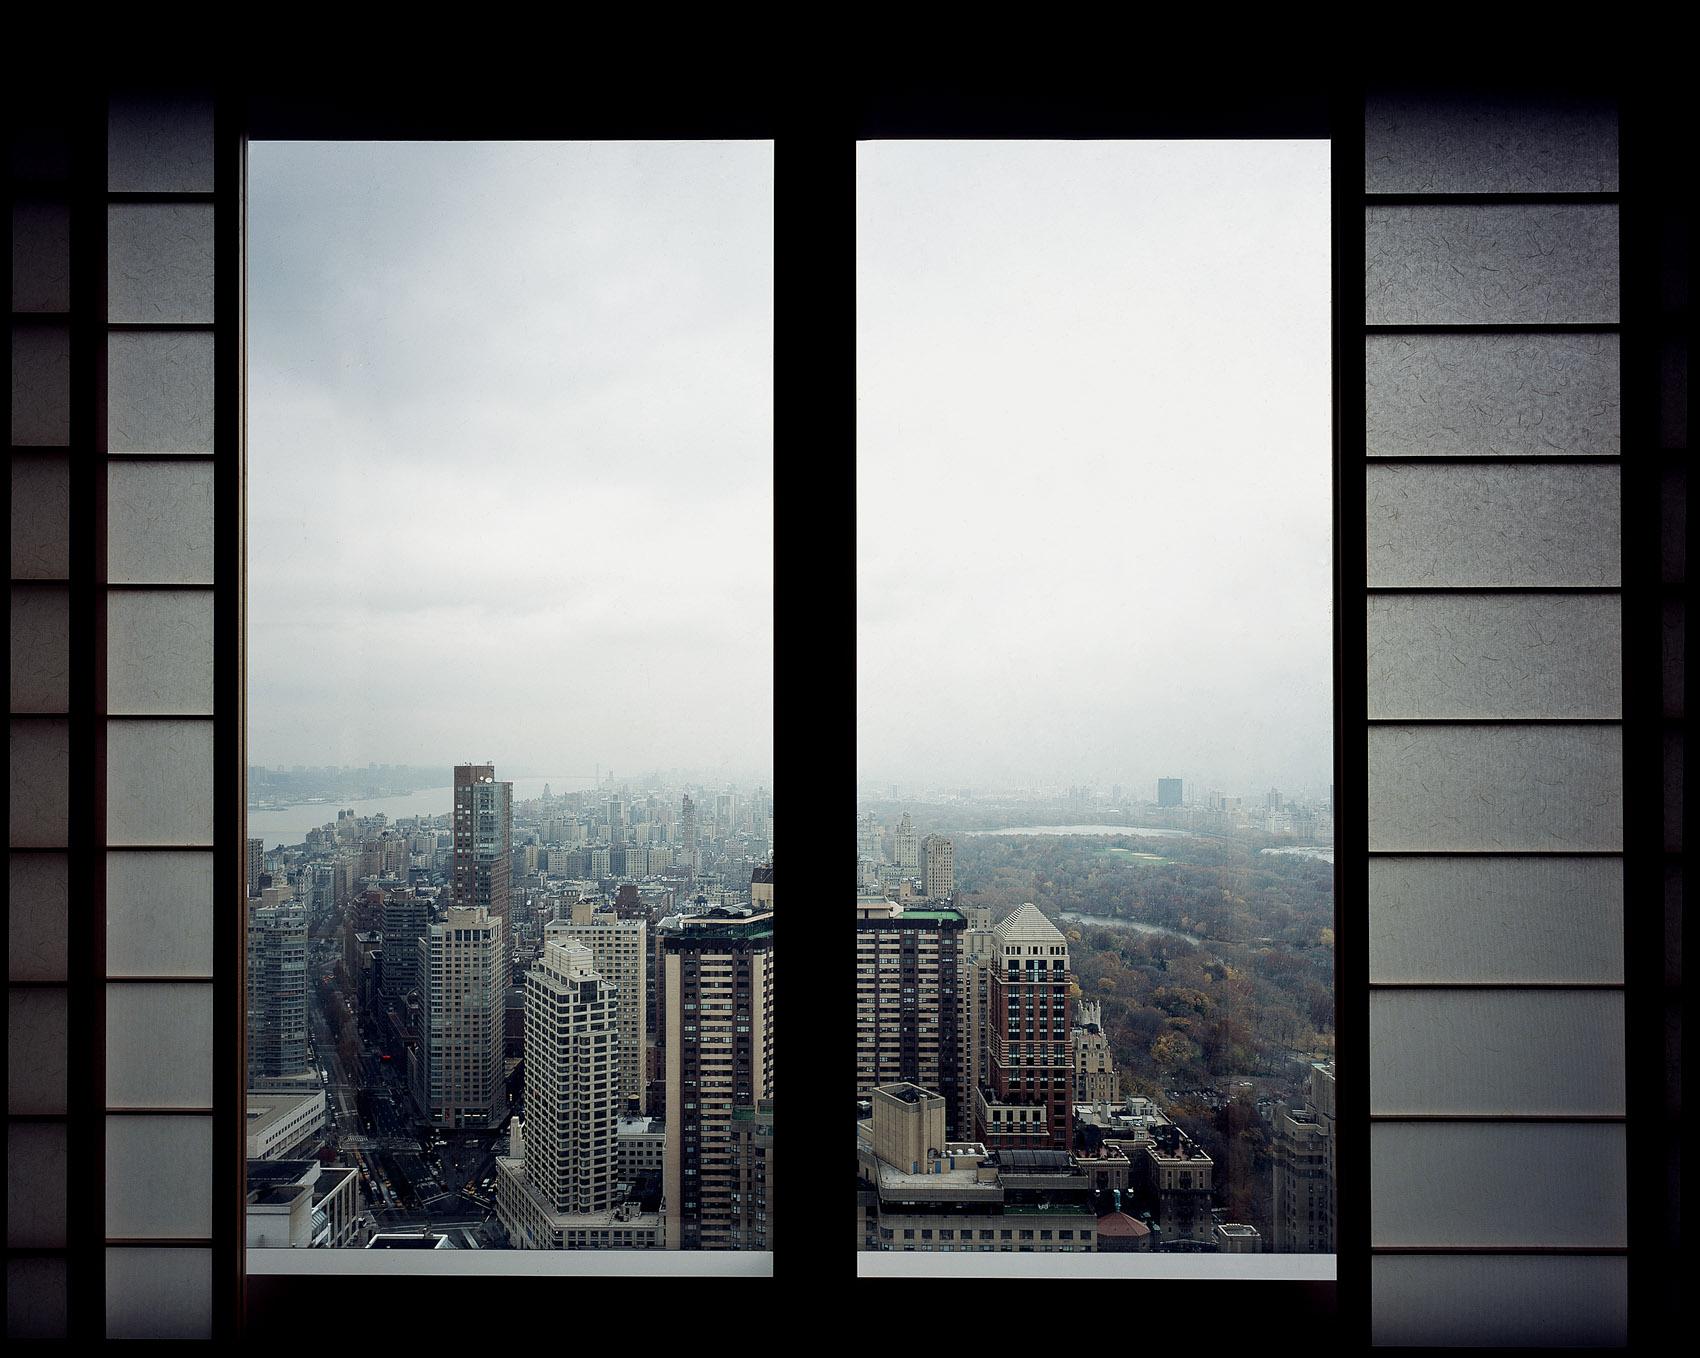 places-001.jpg